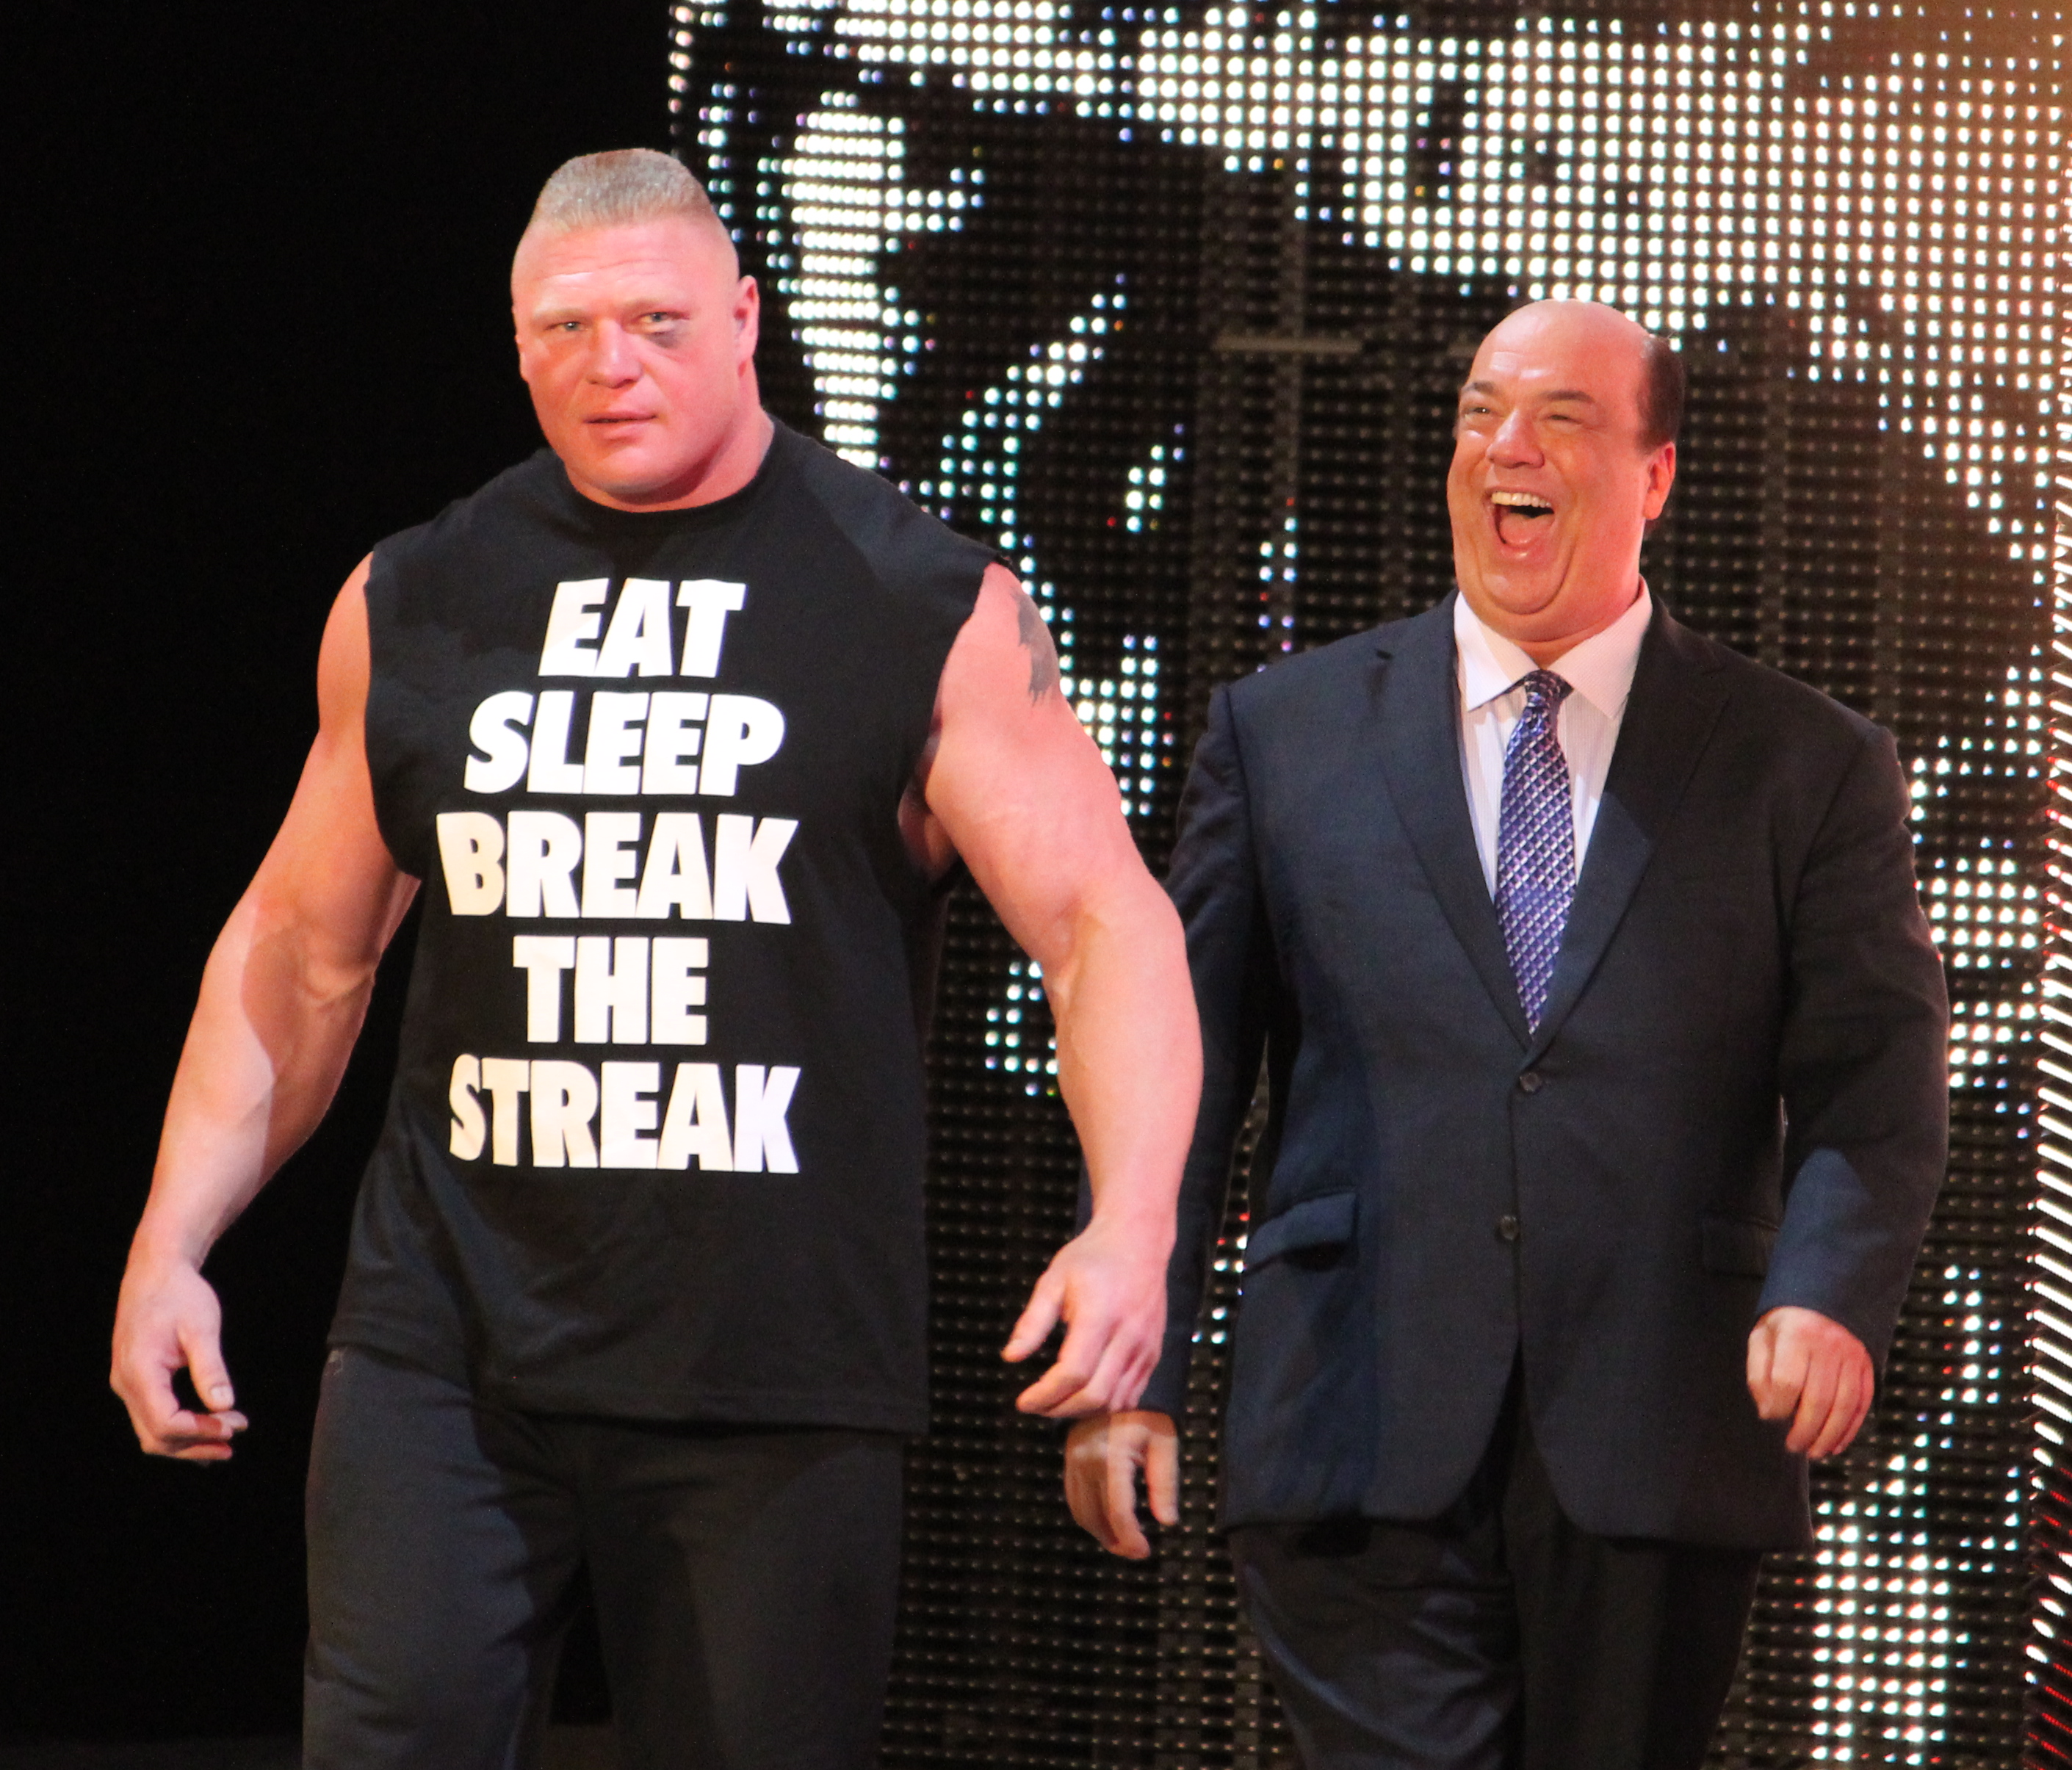 WWE_Raw_IMG_5540_(13772855913)_(cropped)